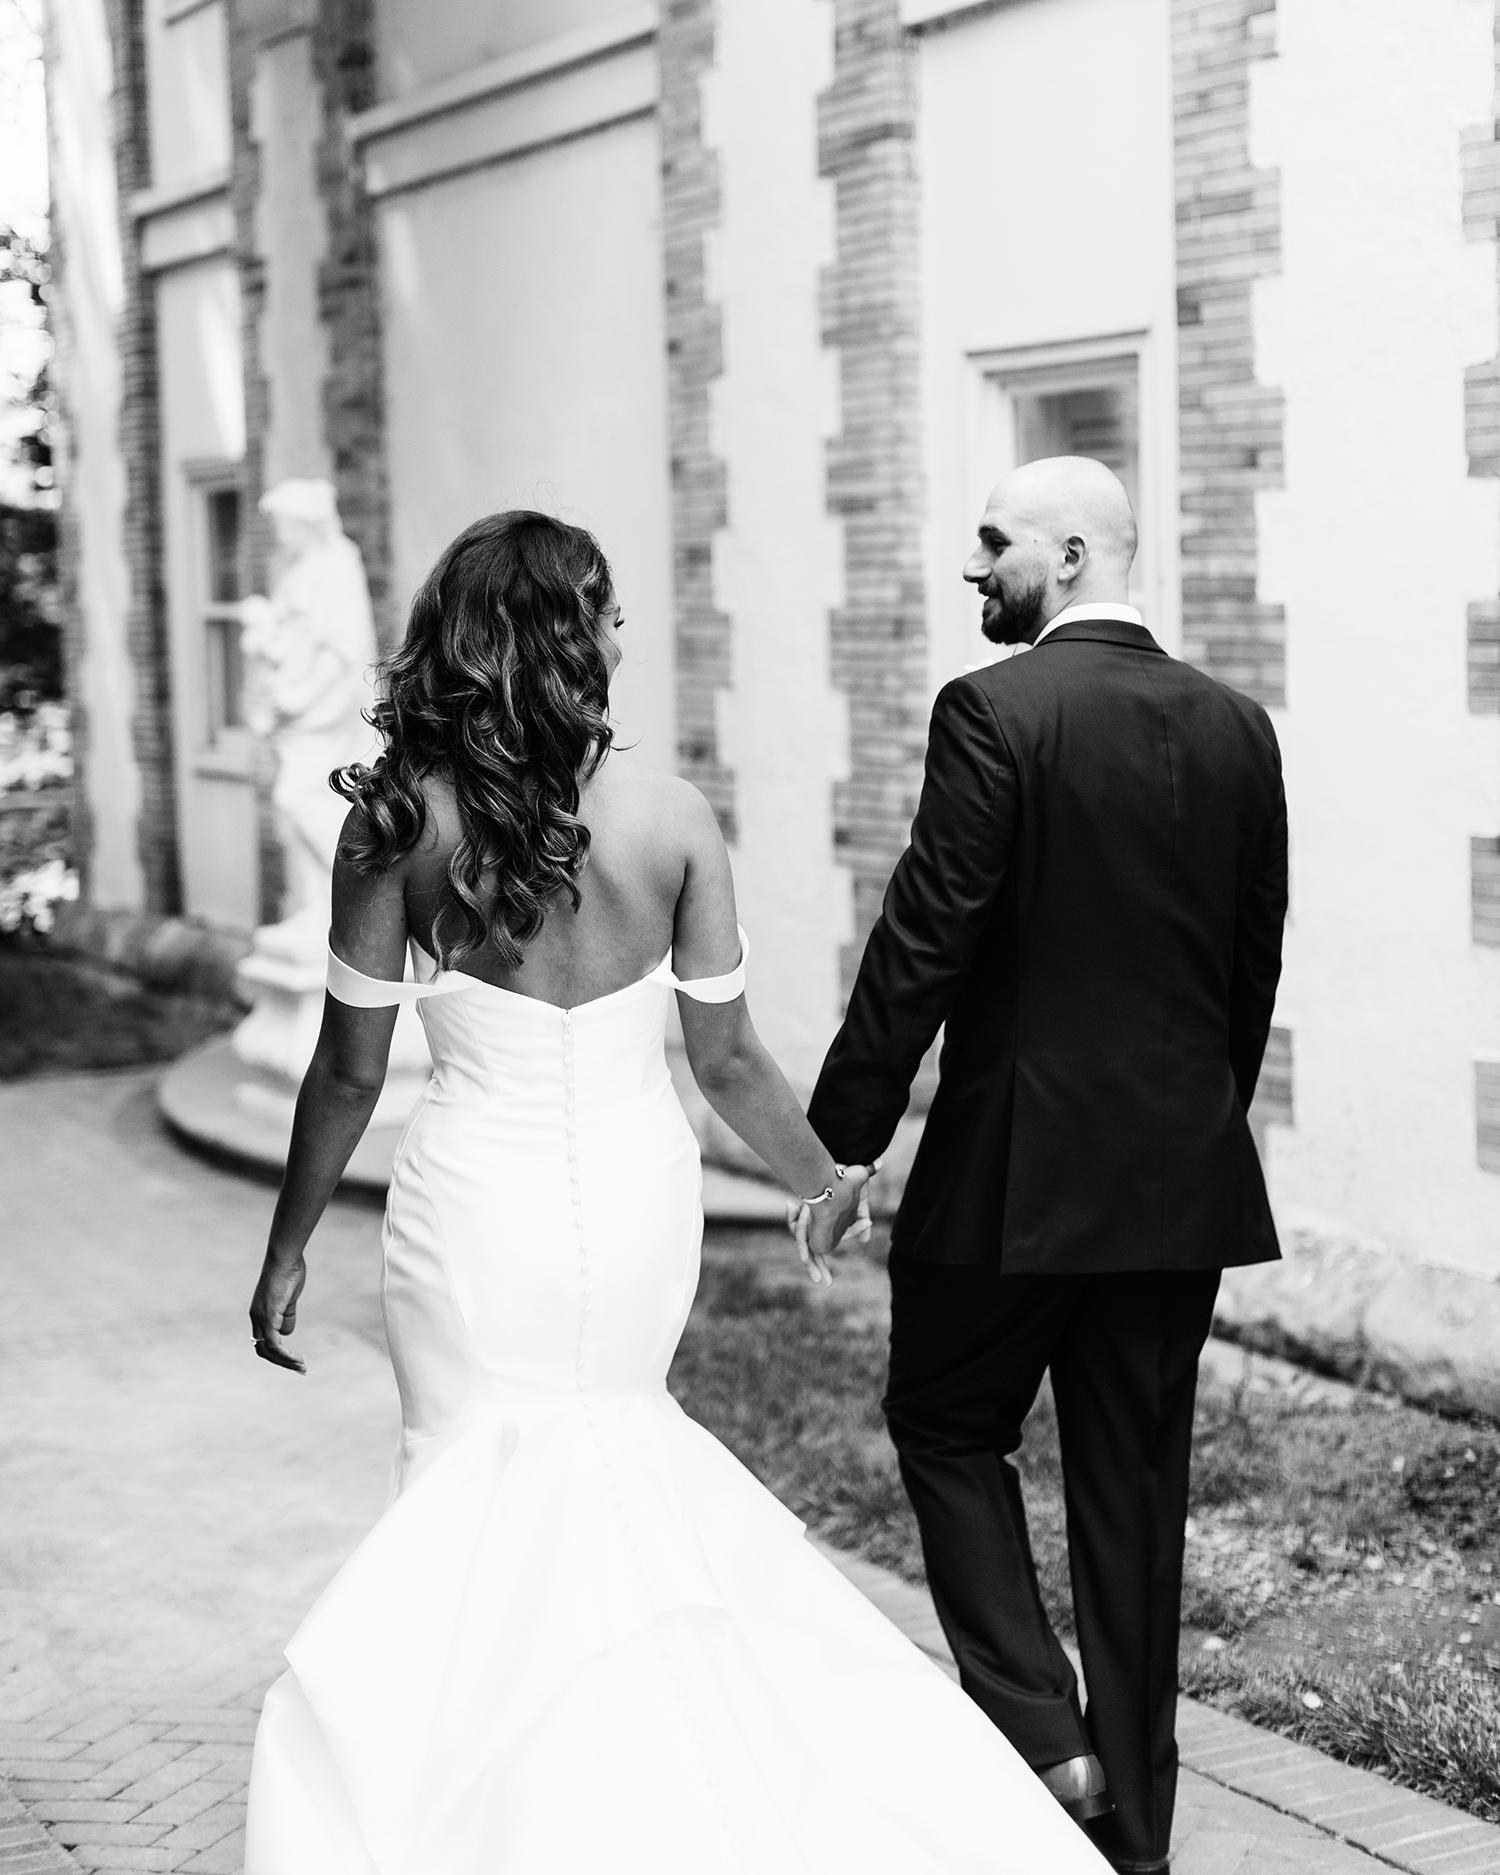 bryanna nick wedding couple bride groom holding hands